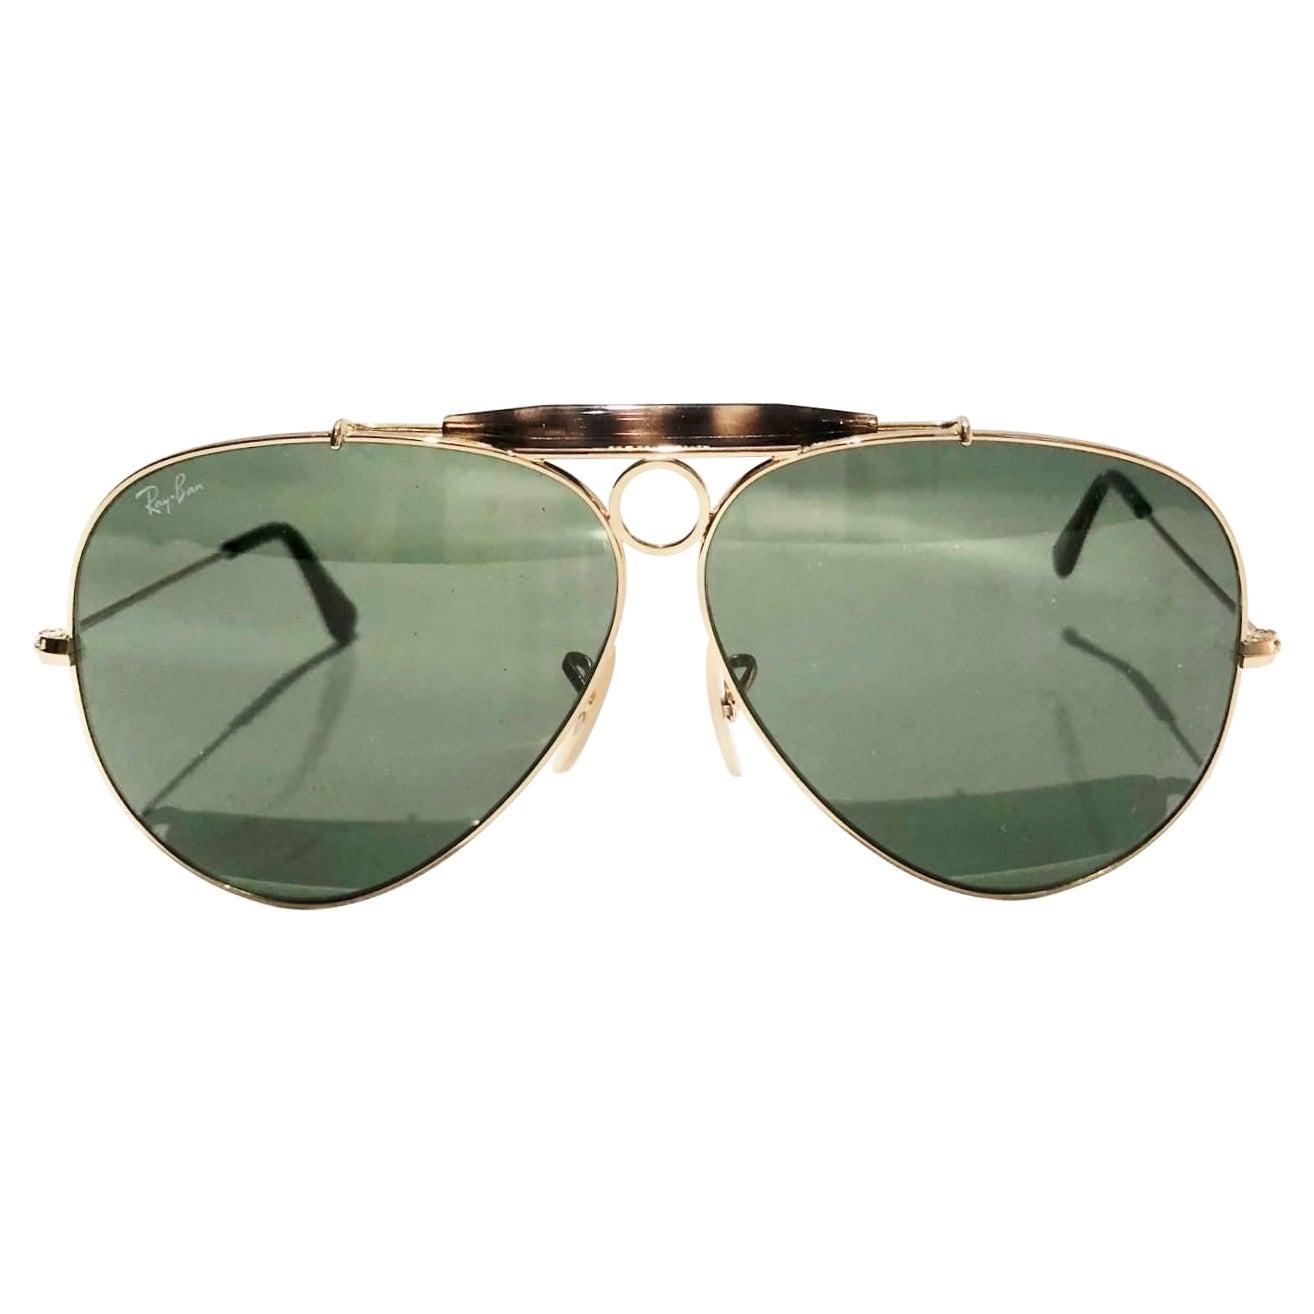 Ray Ban Aviator Shooter Gold Frame Sunglasses